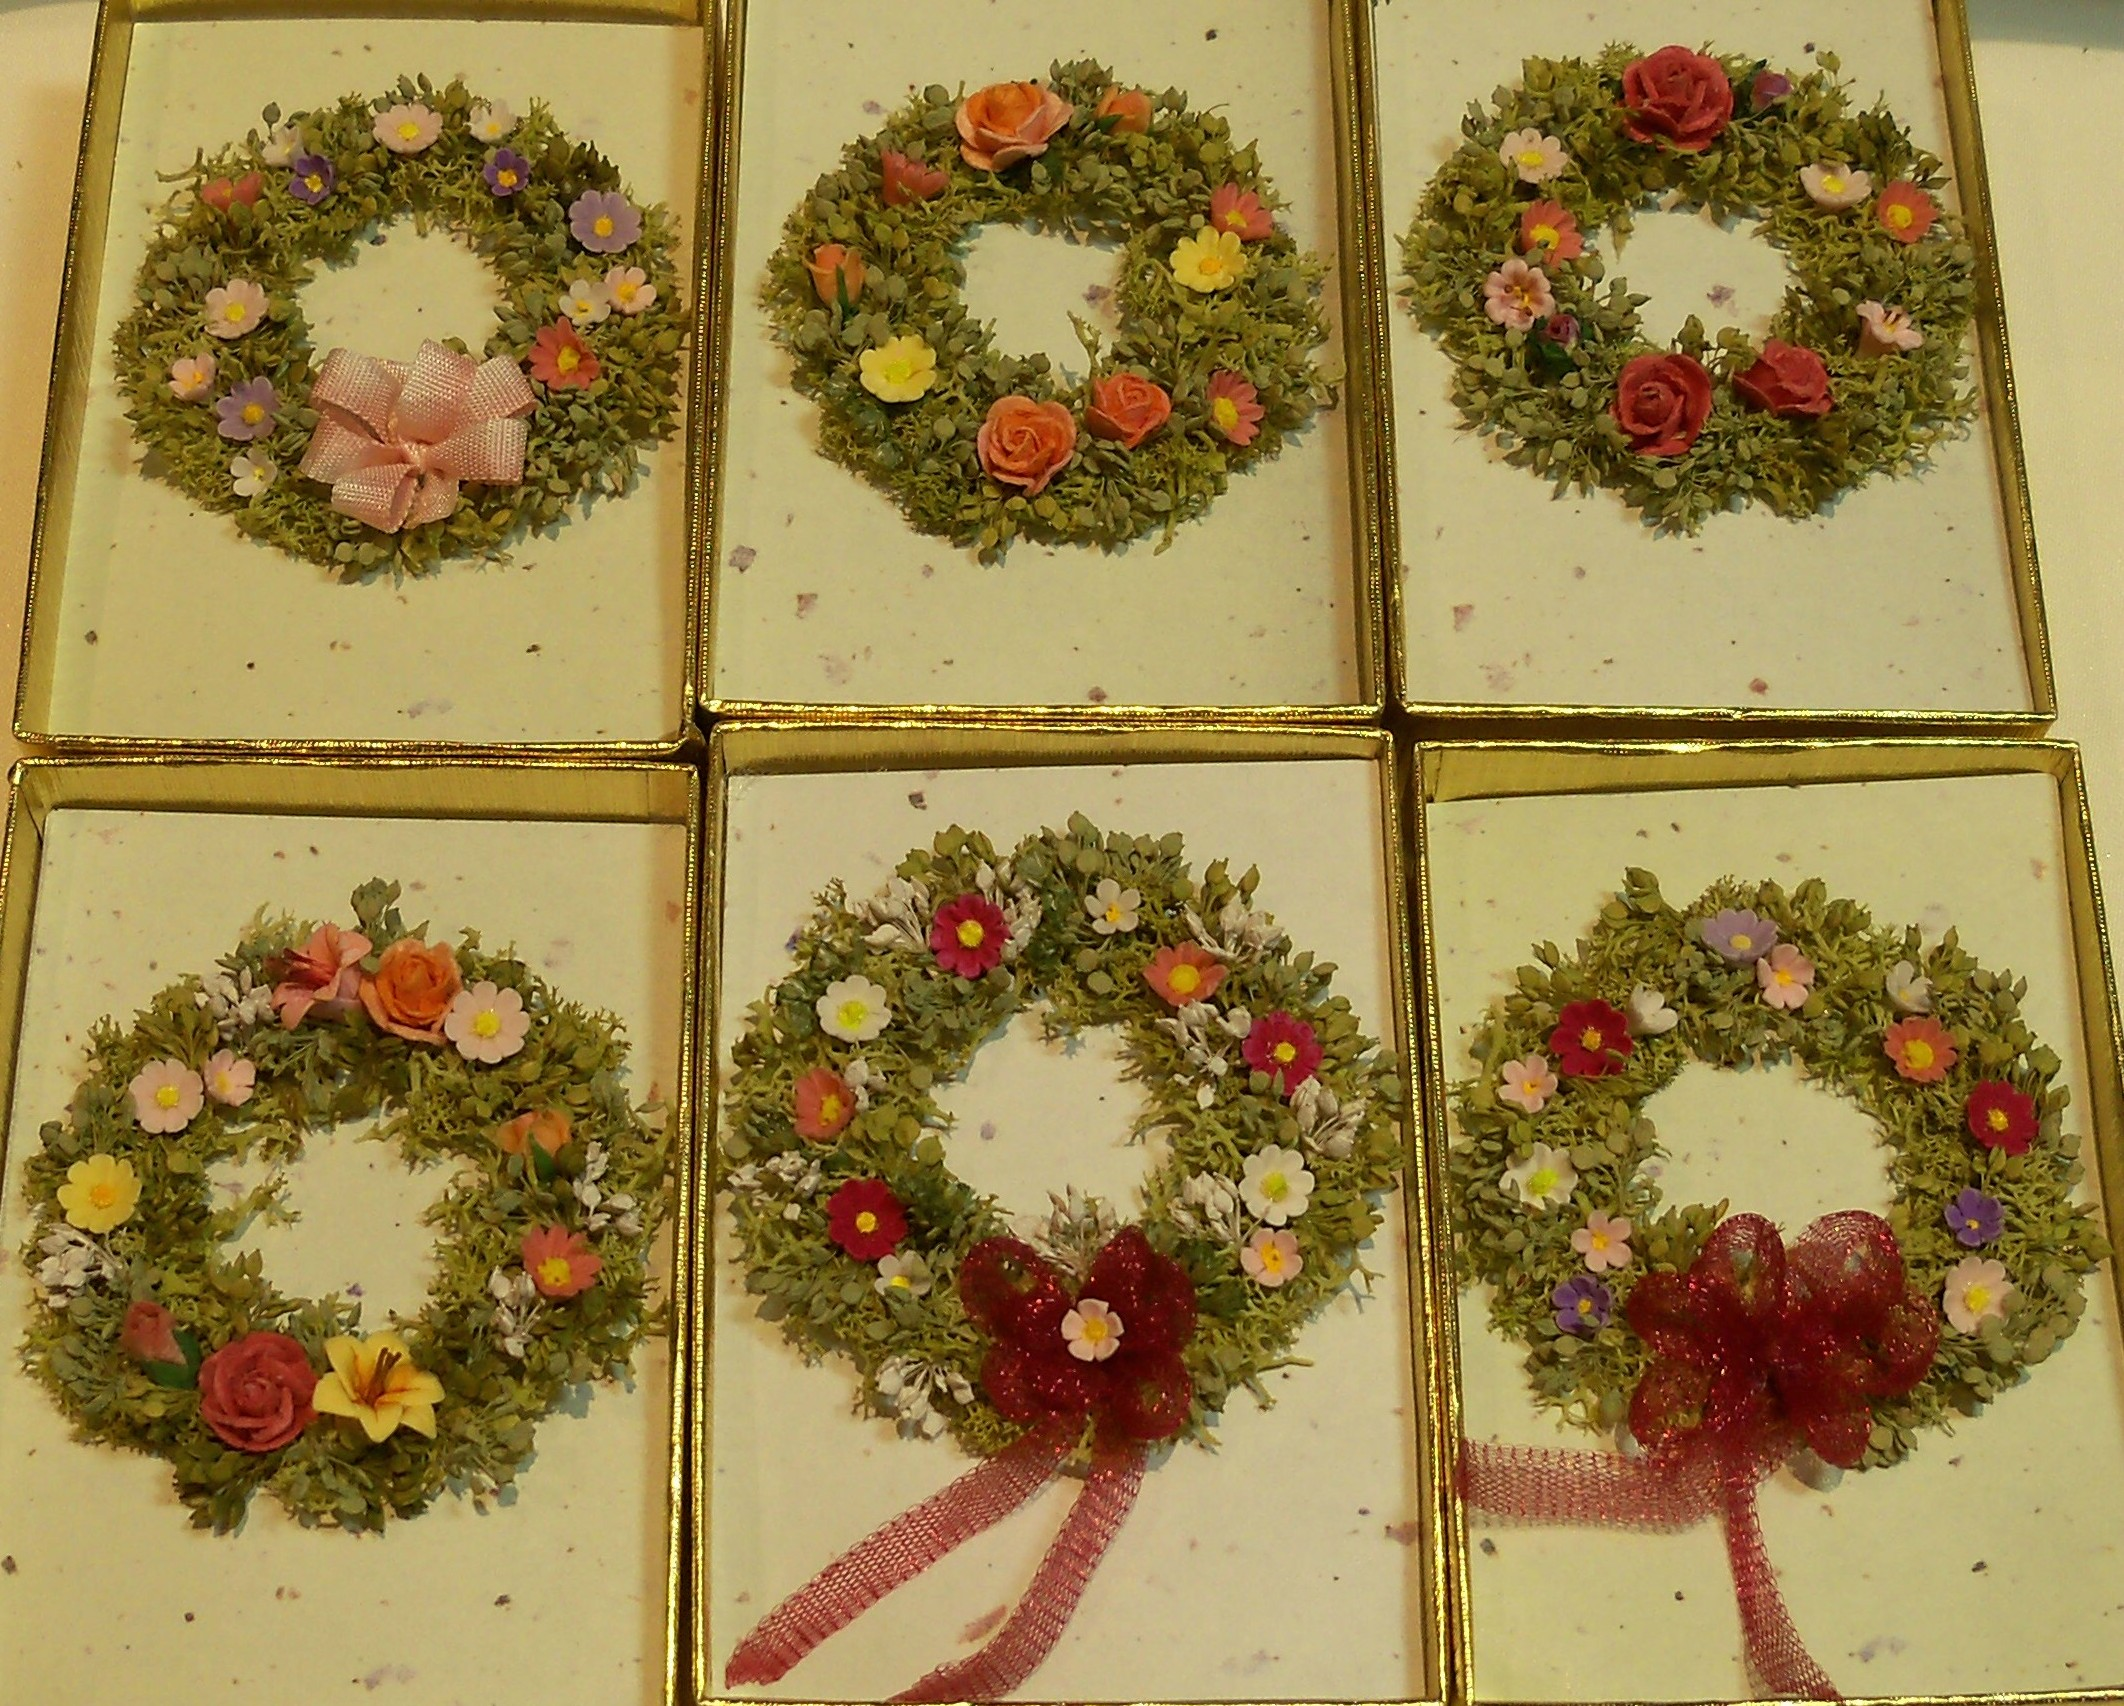 Spring flower wreaths